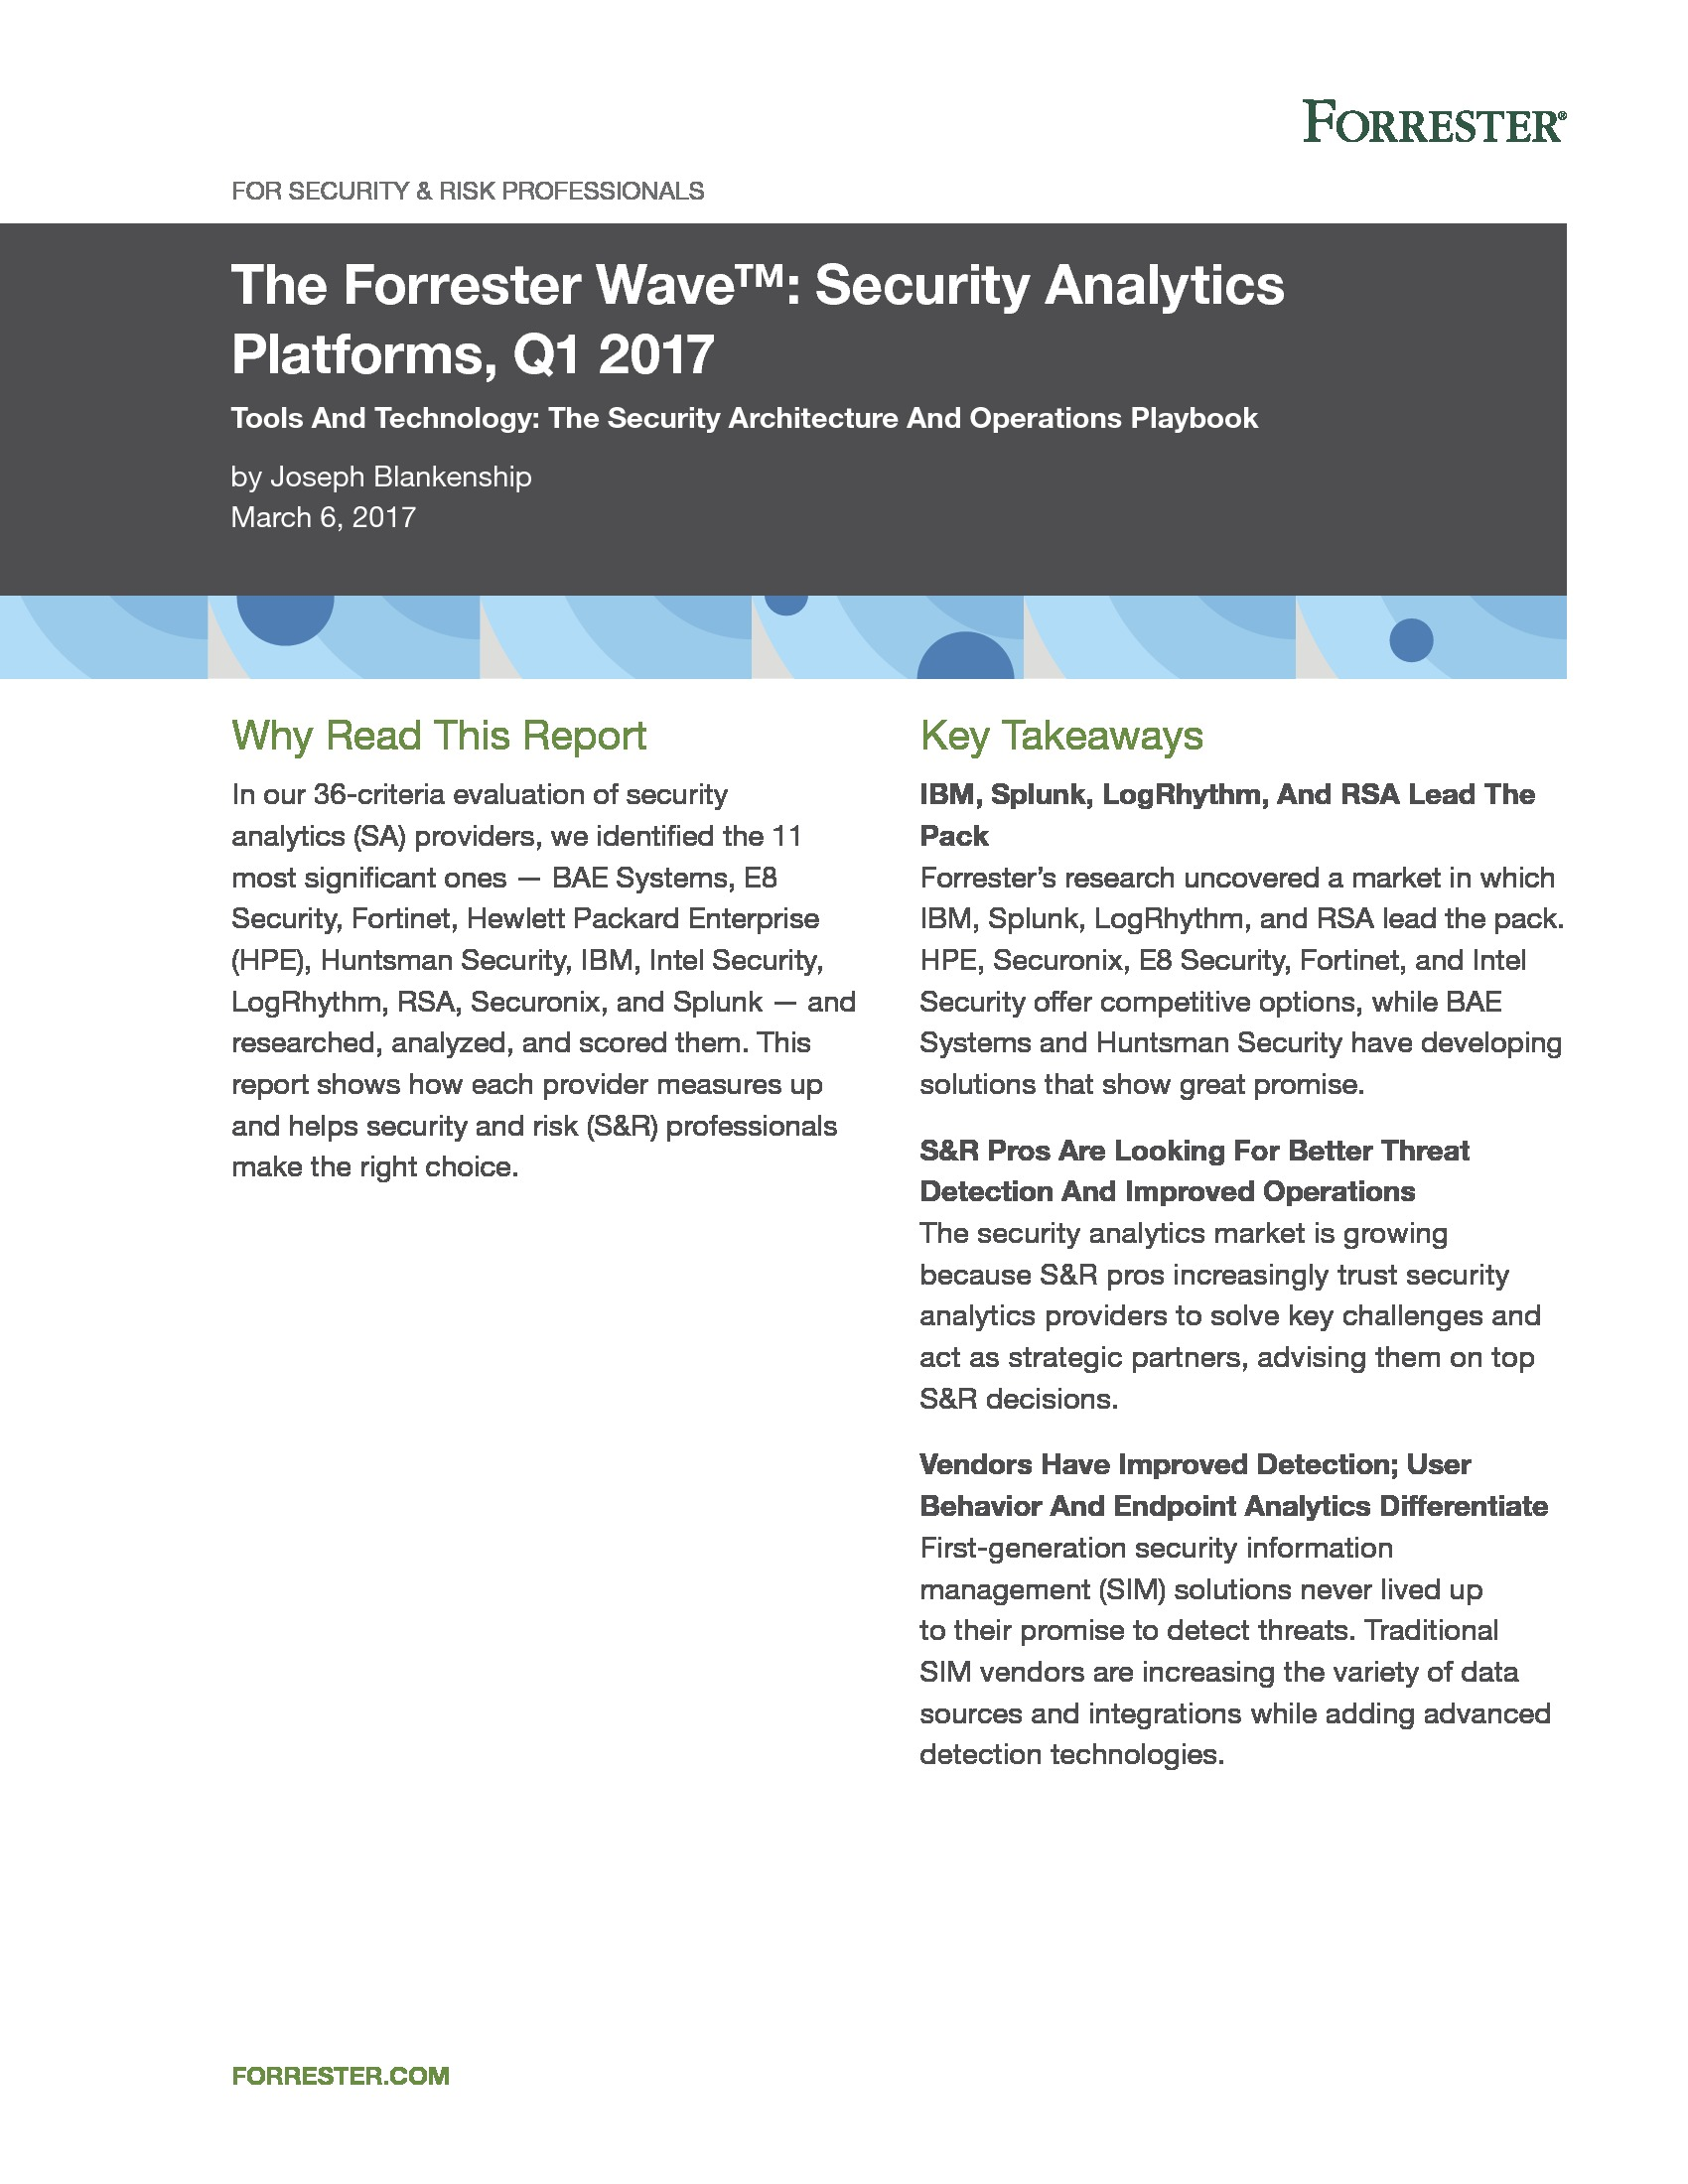 GOV - IBM - Smarter Microsite 2018 - The Forrester Wave